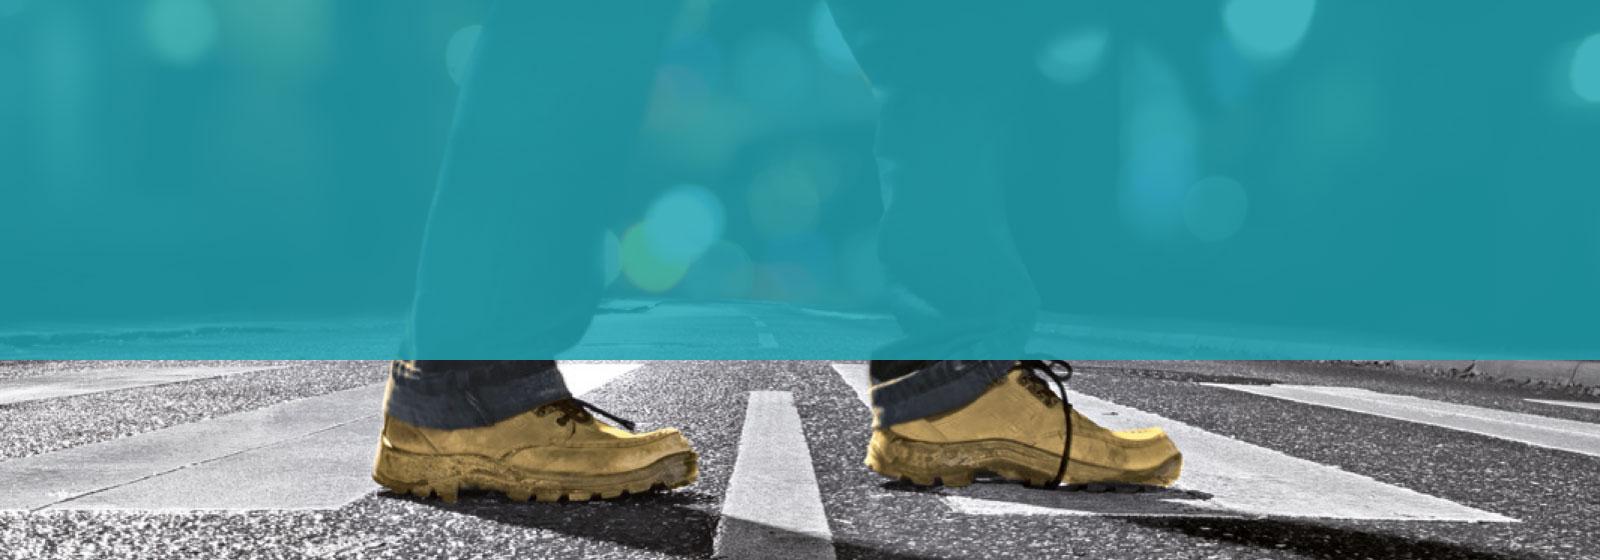 adriatica-asfalti-raggiungere-meta1